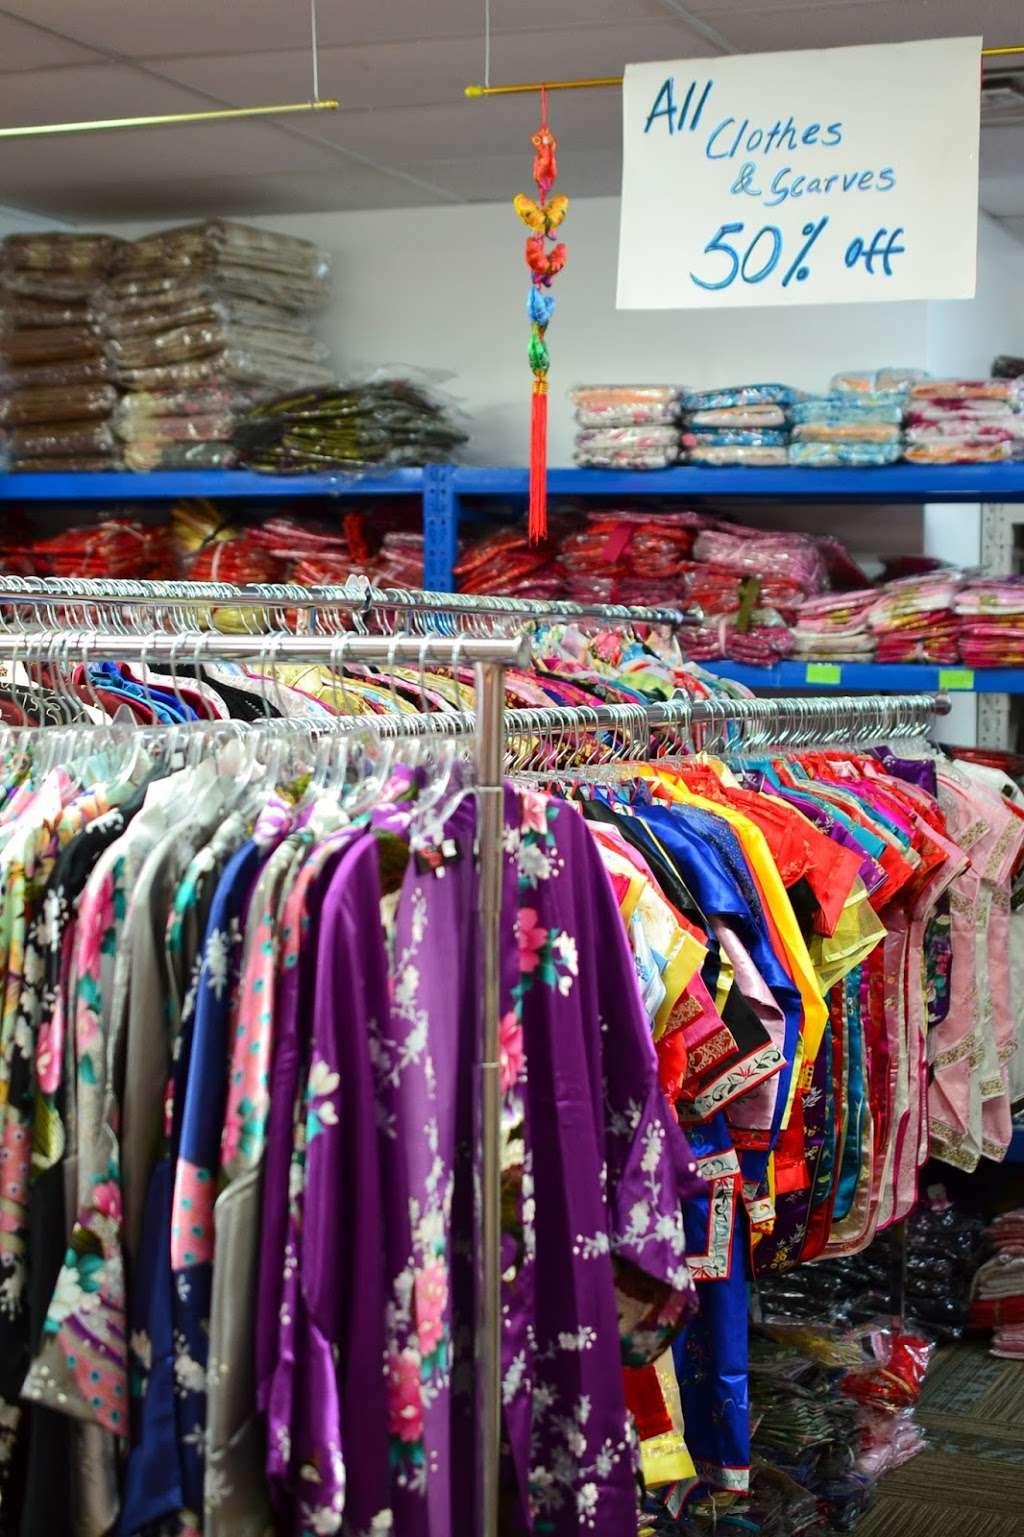 Mulan Asian Market - clothing store  | Photo 3 of 10 | Address: 6865 Harwin Dr B, Houston, TX 77036, USA | Phone: (713) 922-8216